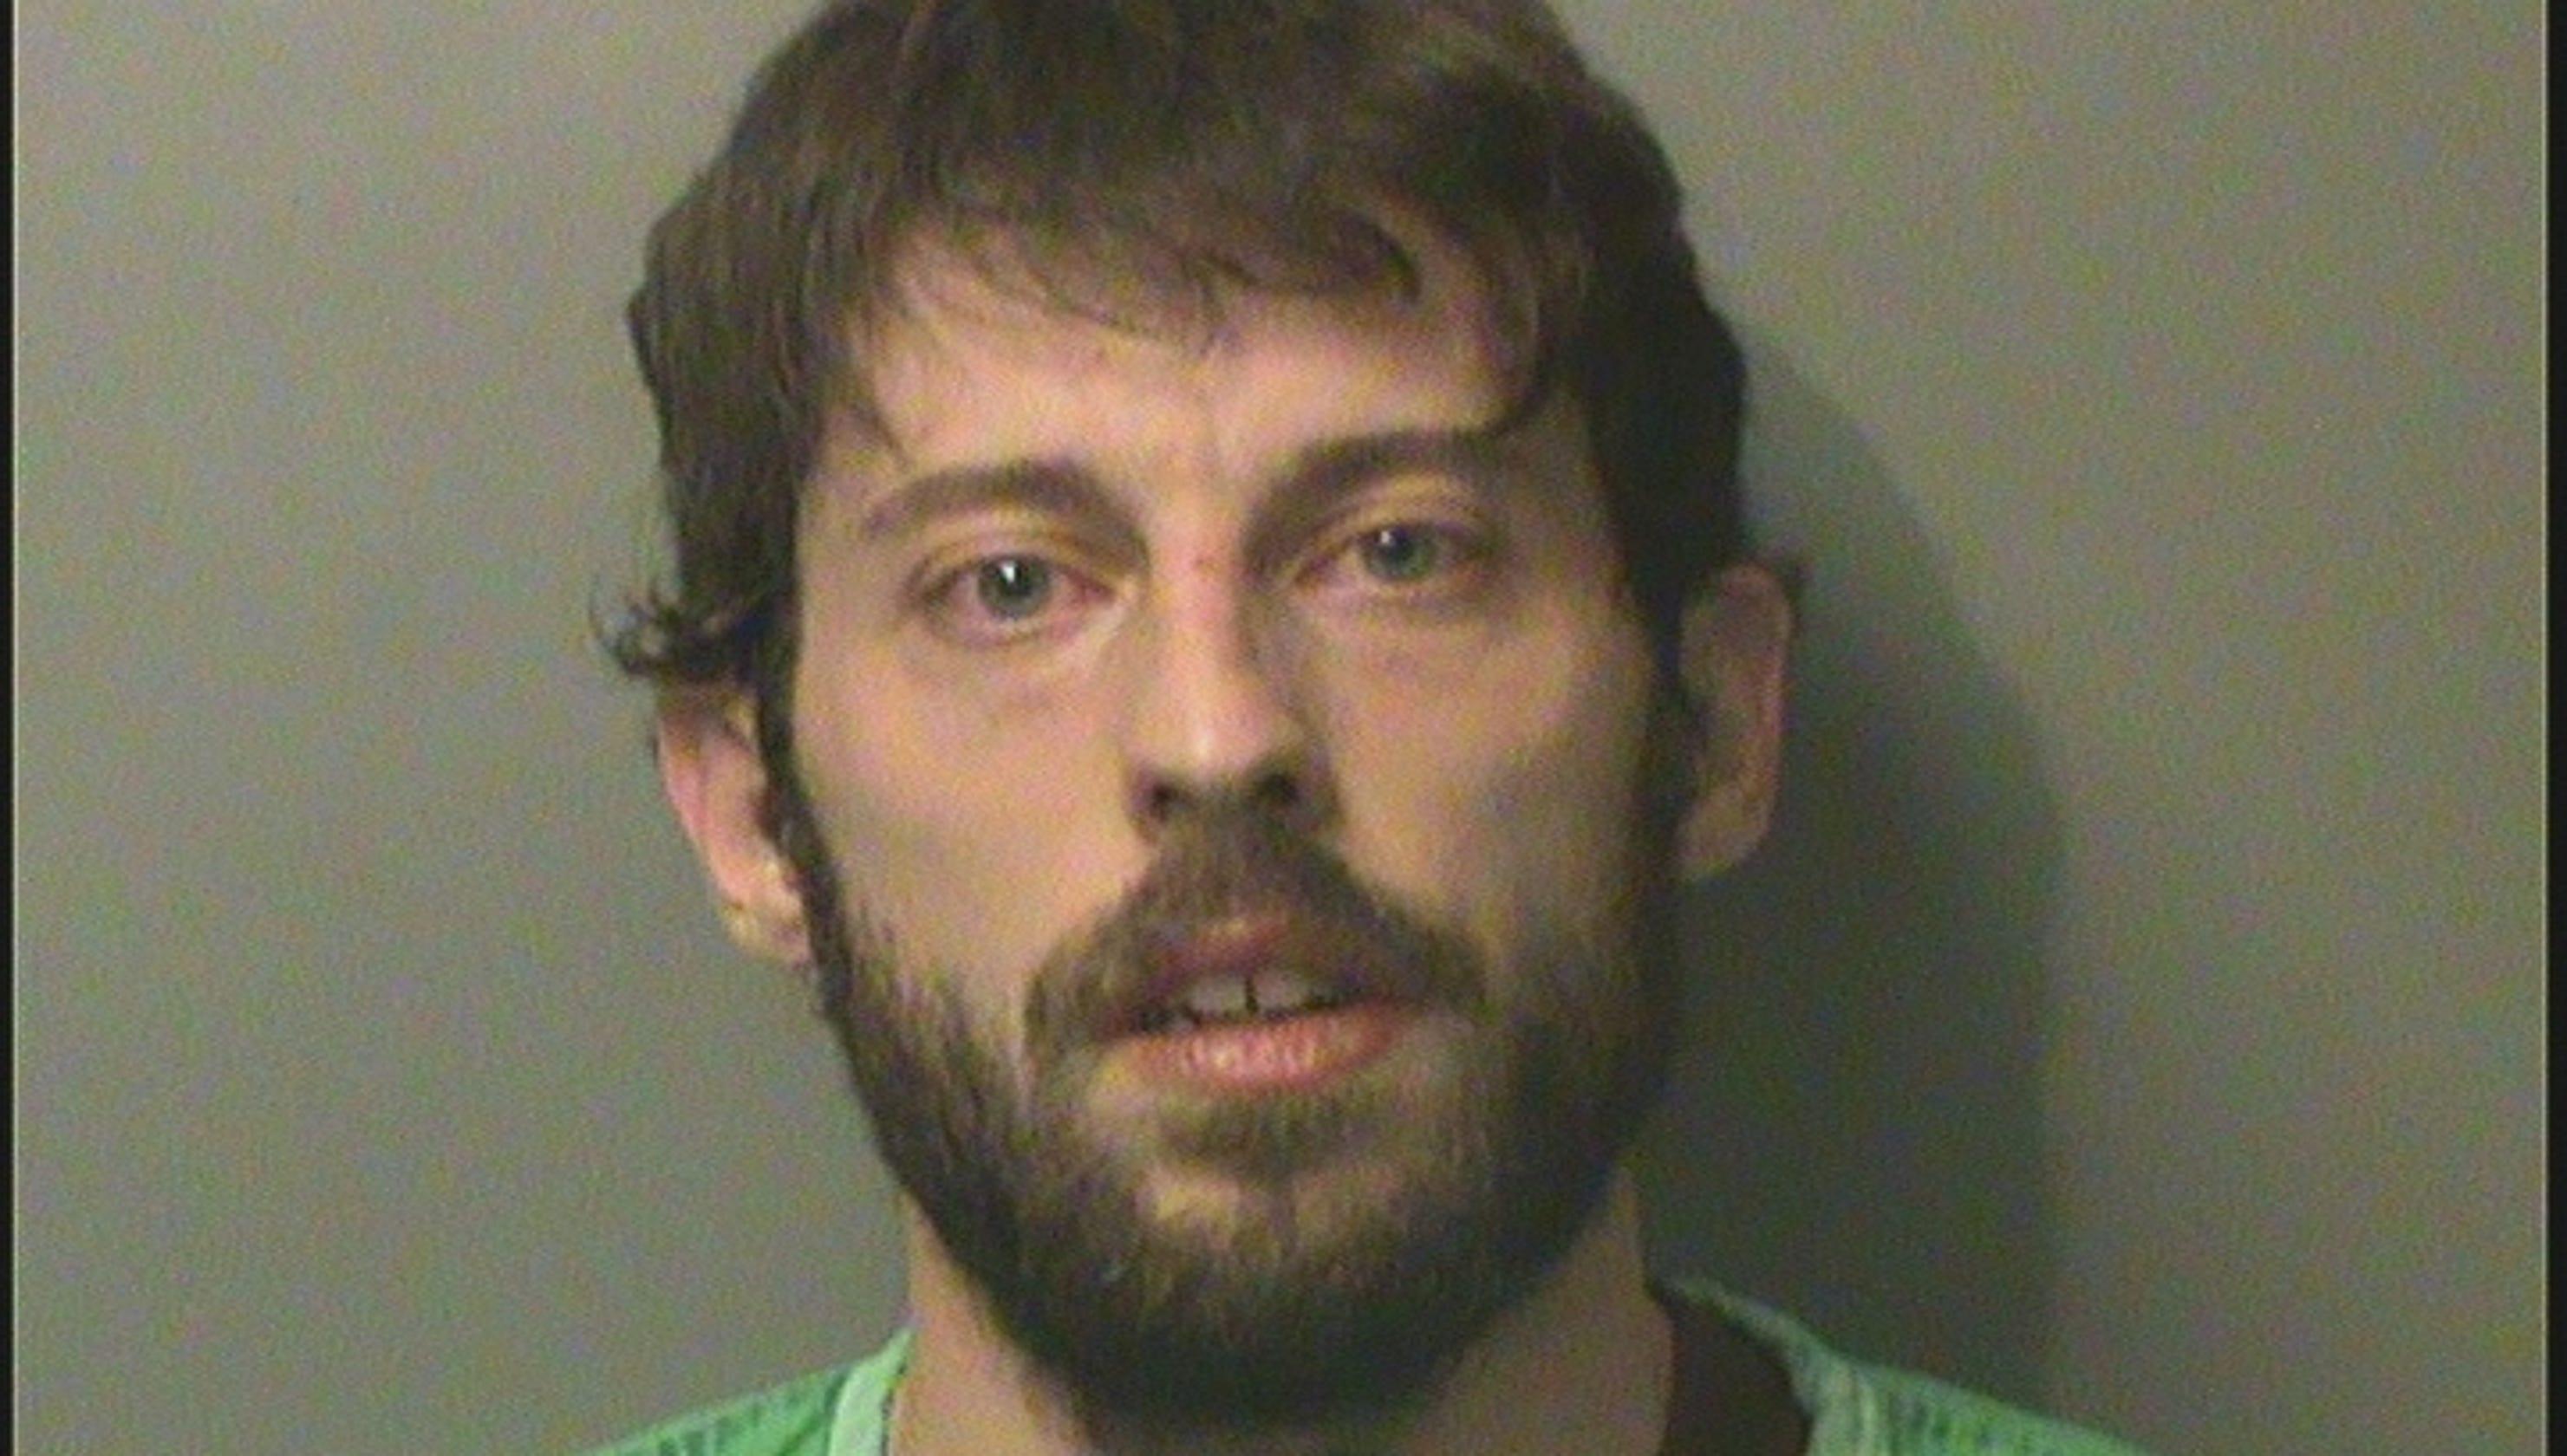 Polk County Jail lawsuit: Man says jailer, sheriff violated